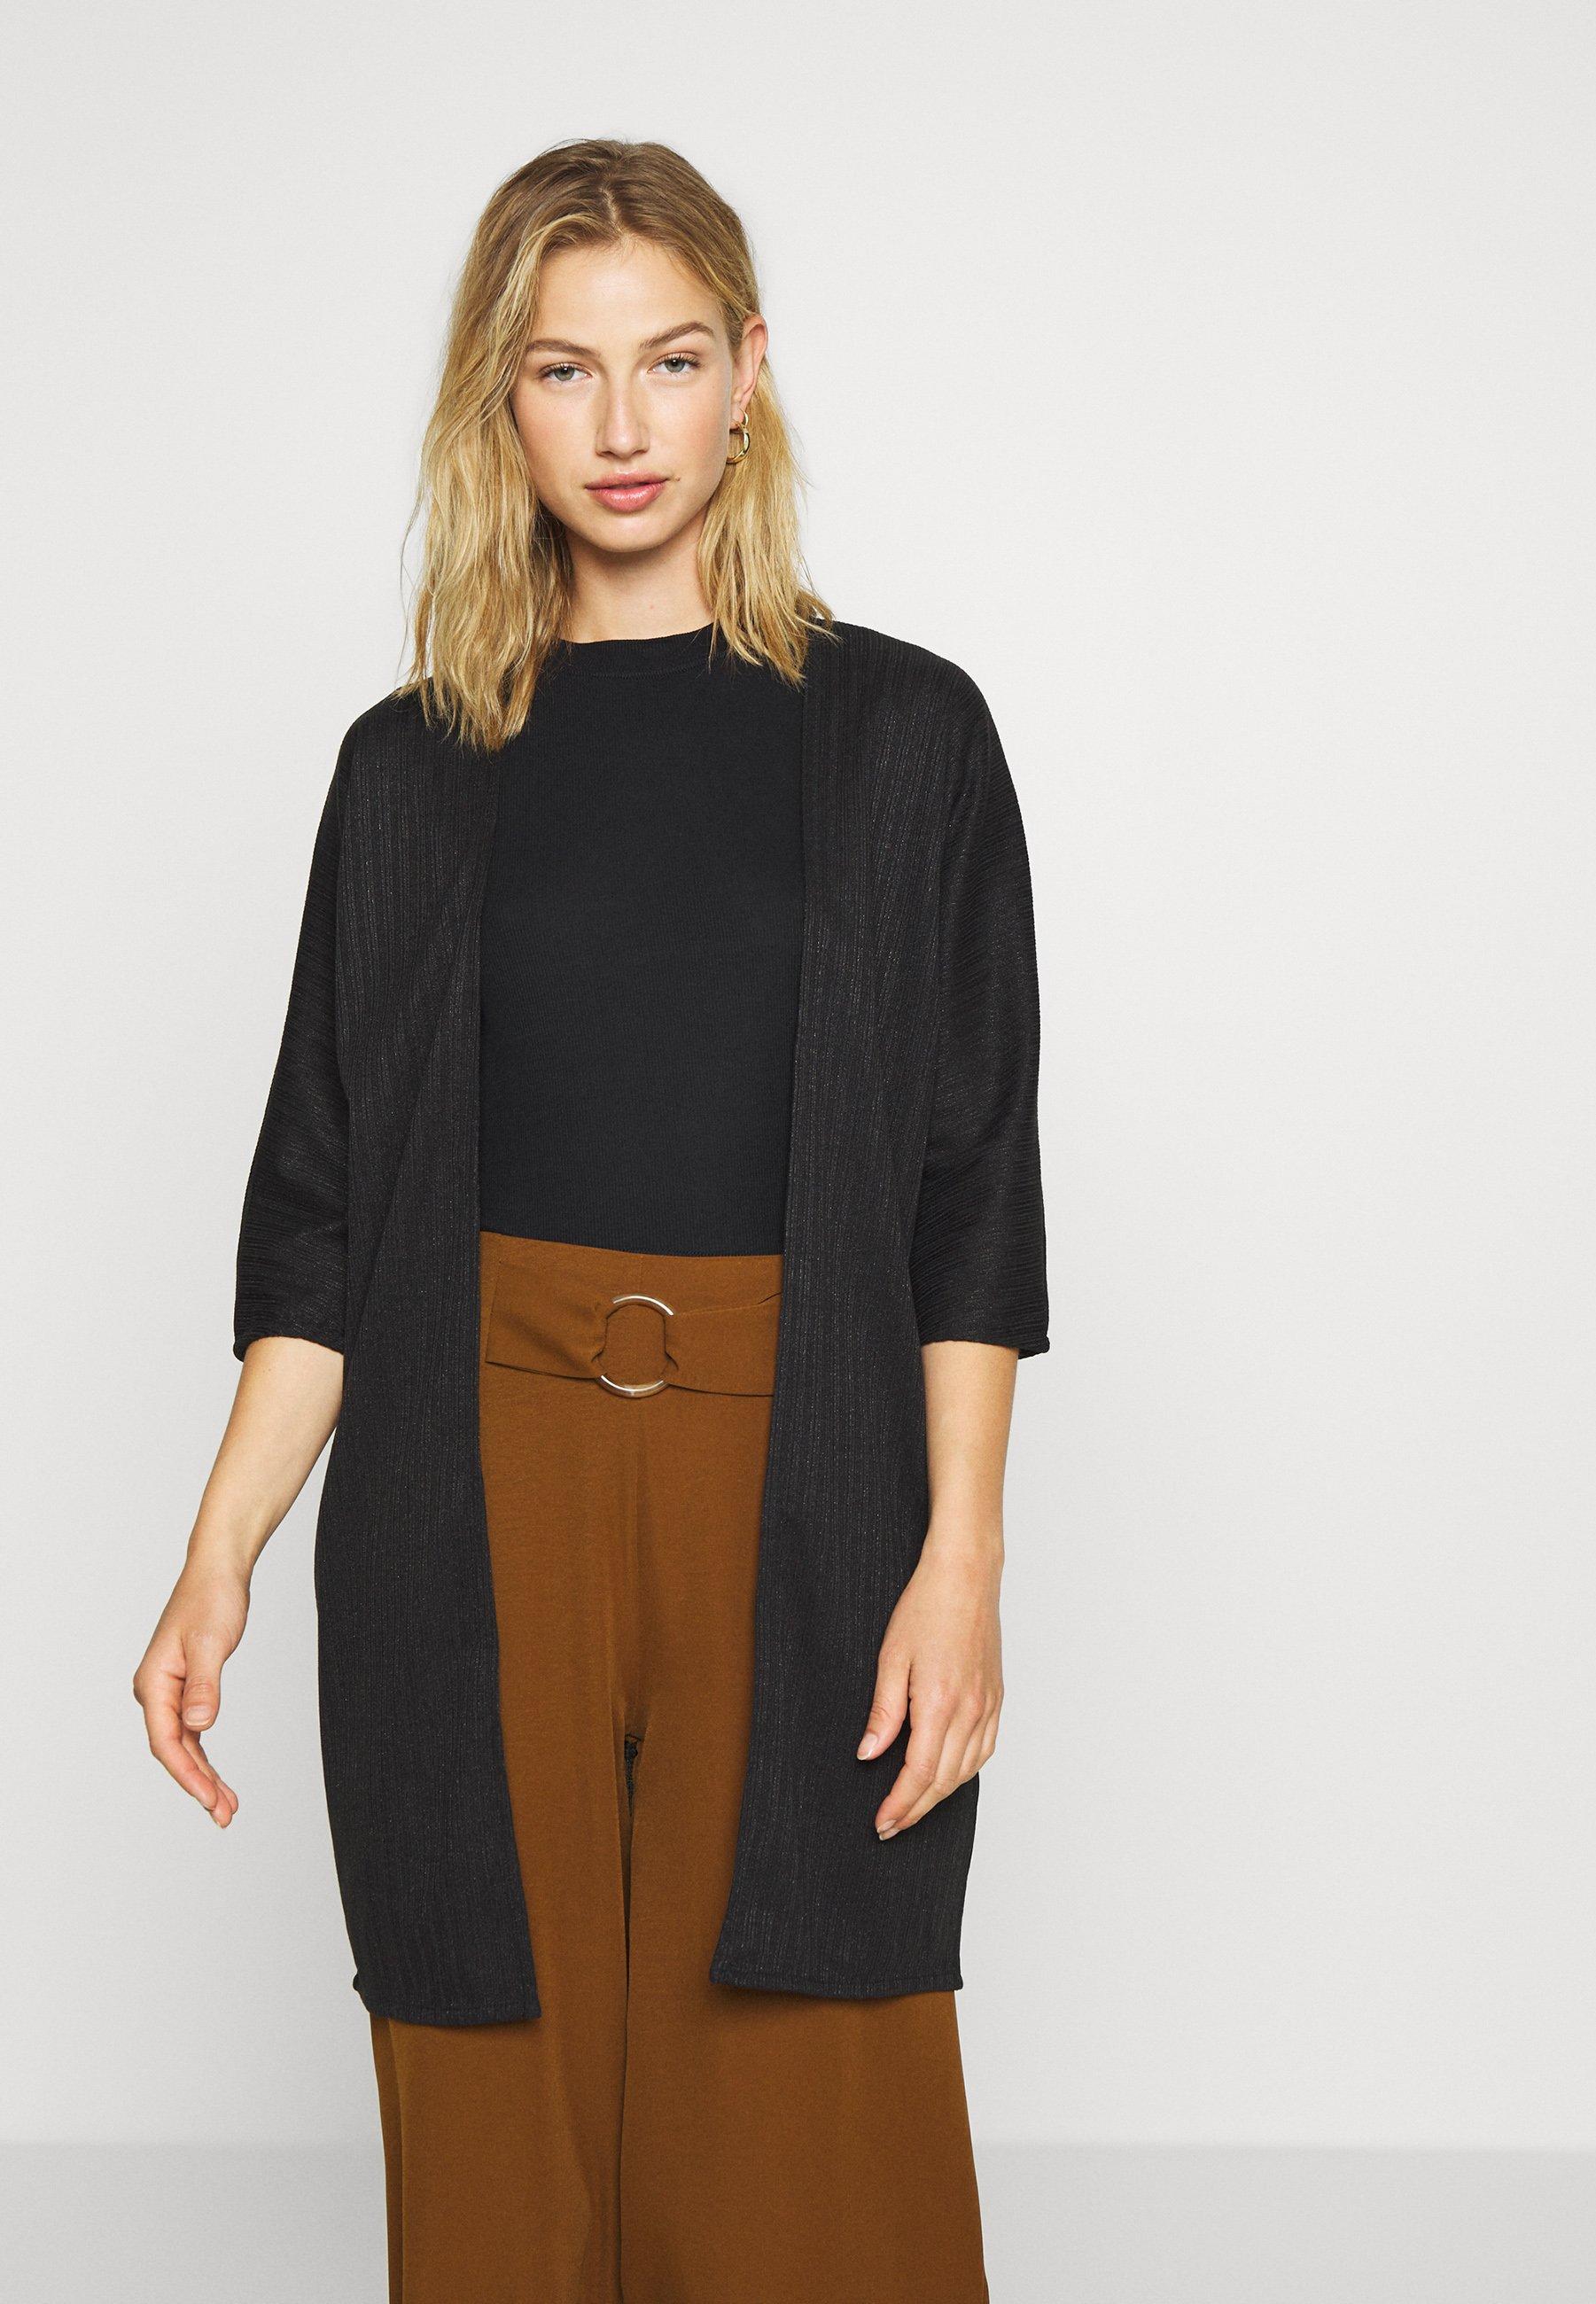 ICHI IHCILO - Vest - black - Dames jas Actueel